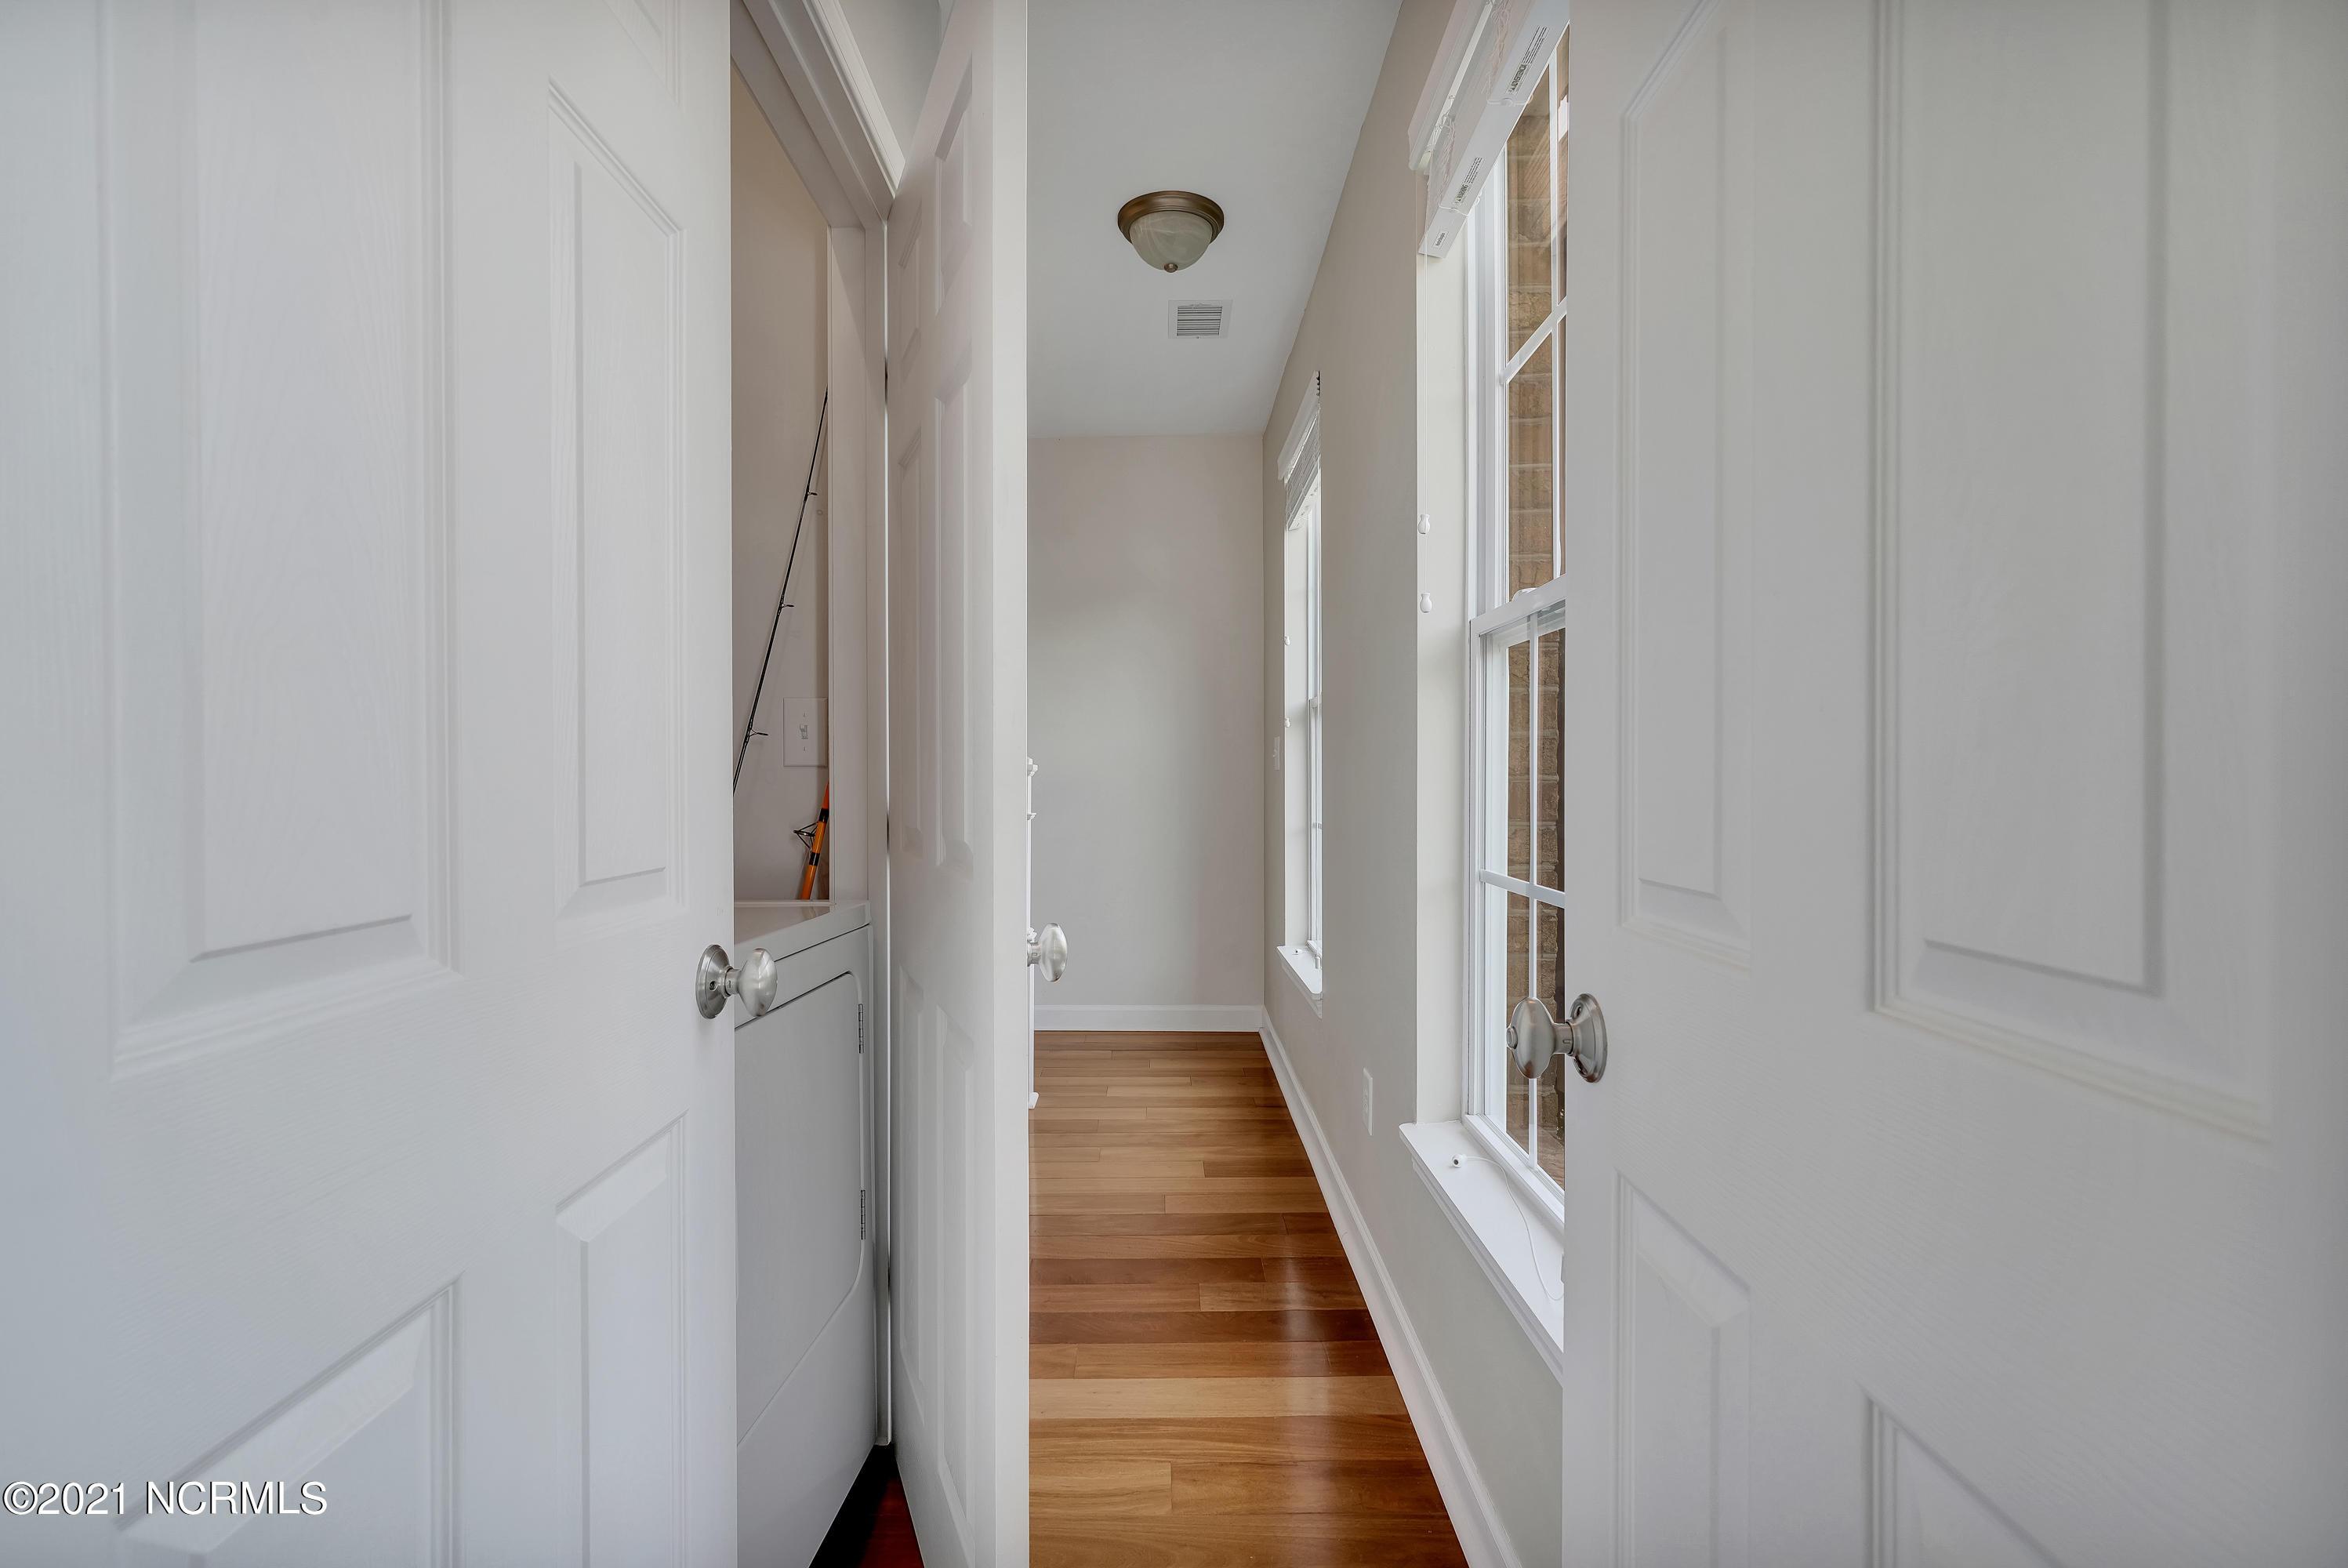 1790 Queen Anne Street, Sunset Beach, North Carolina 28468, 3 Bedrooms Bedrooms, 8 Rooms Rooms,2 BathroomsBathrooms,Townhouse,For sale,Queen Anne,100285137